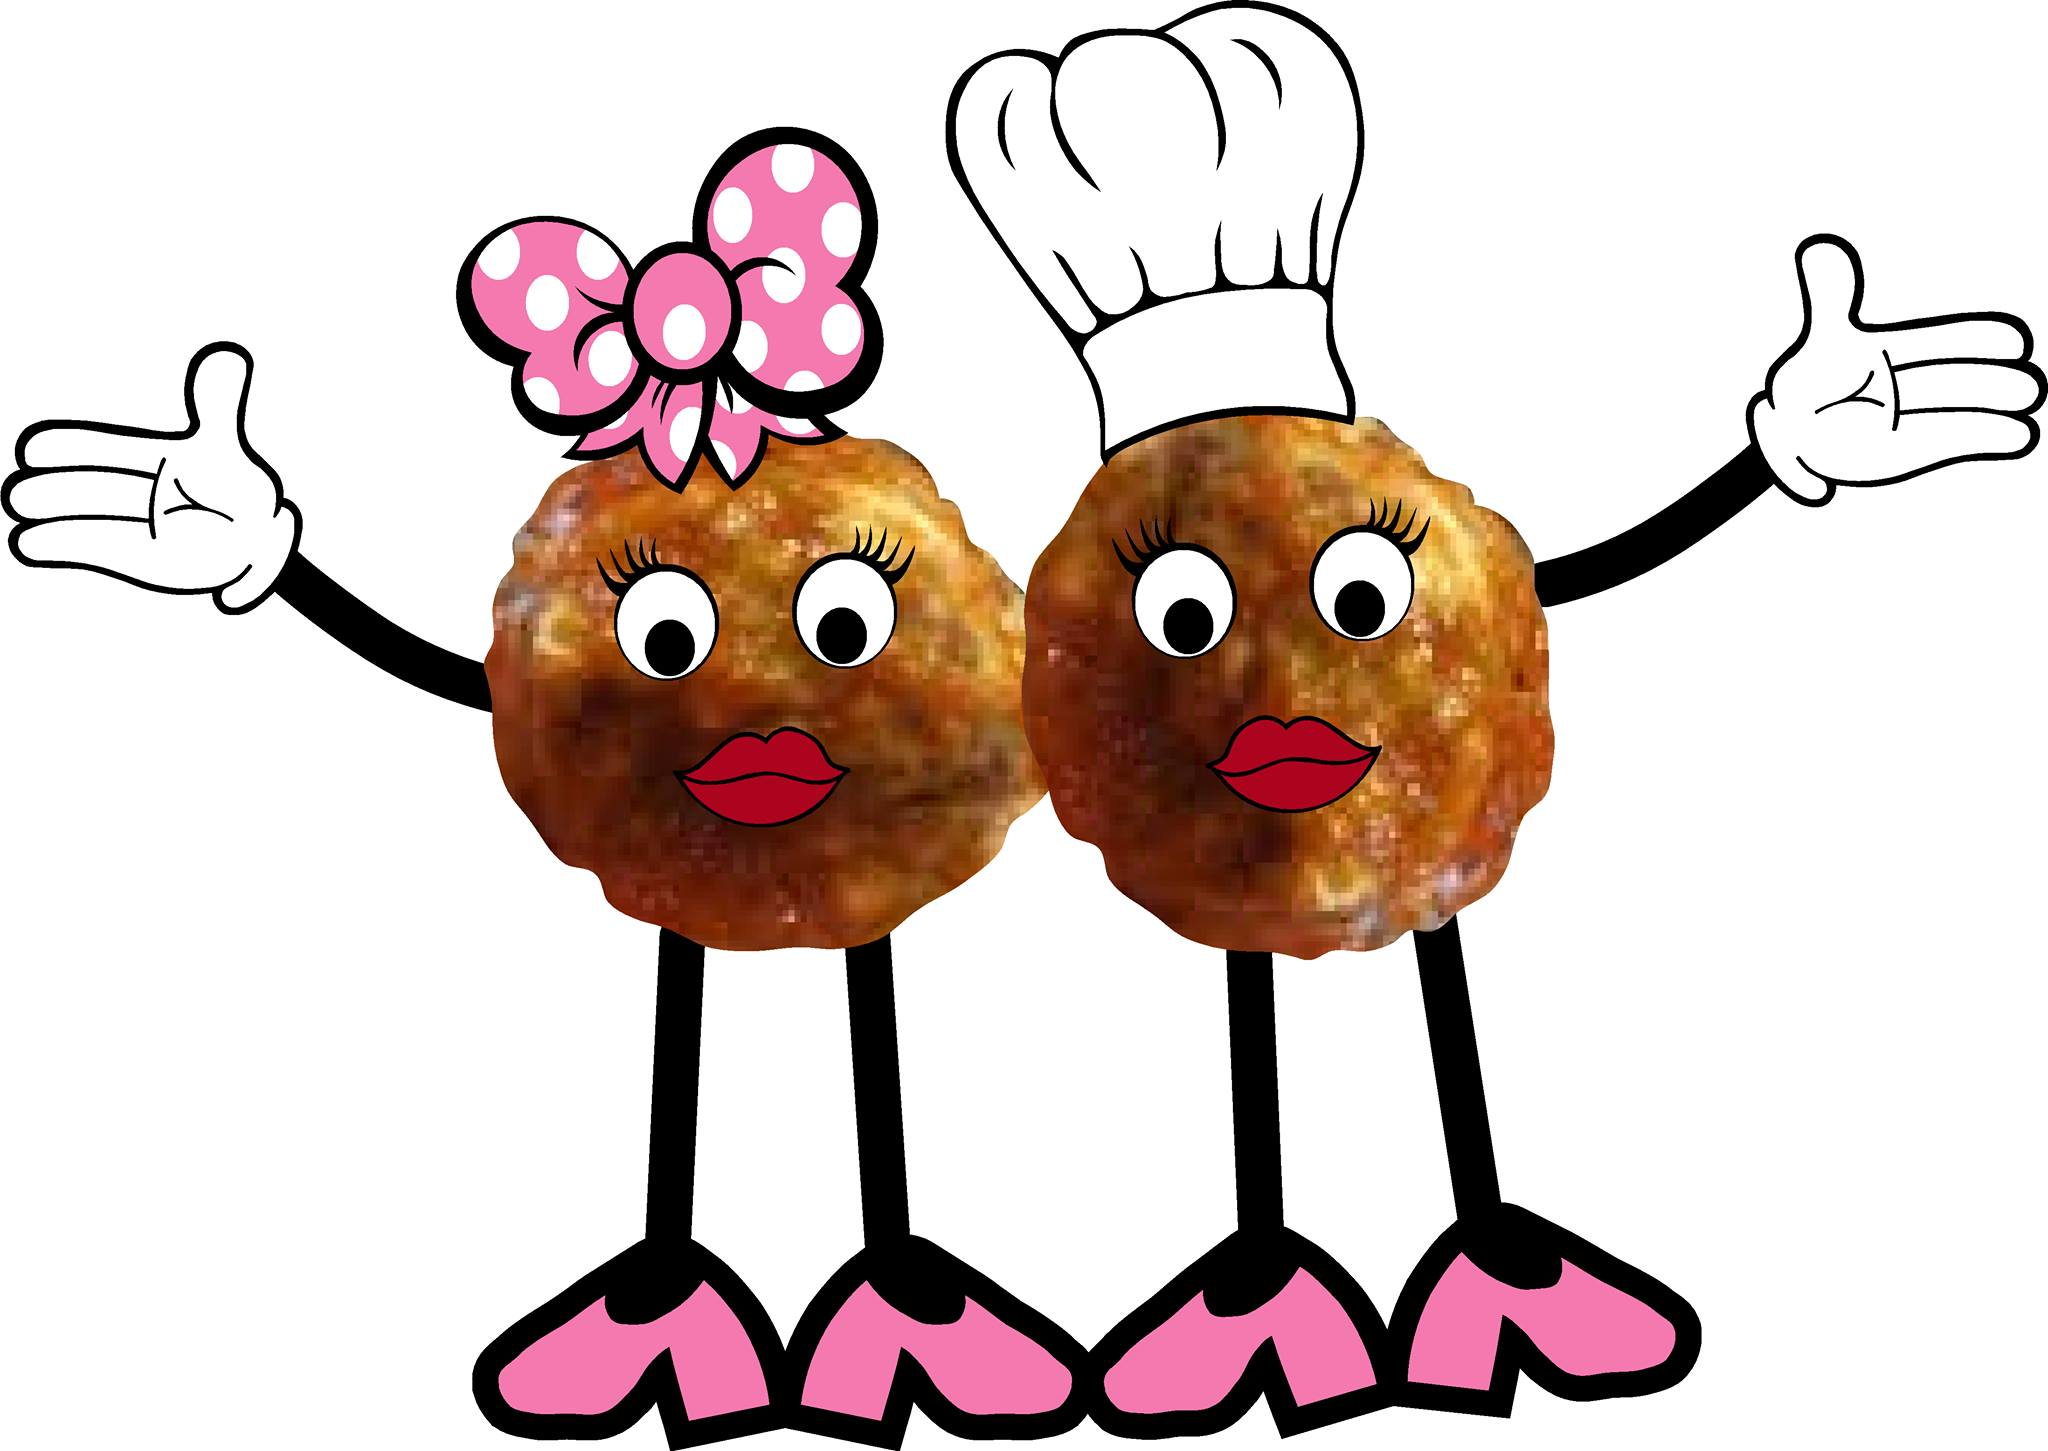 Sassy Meatballs